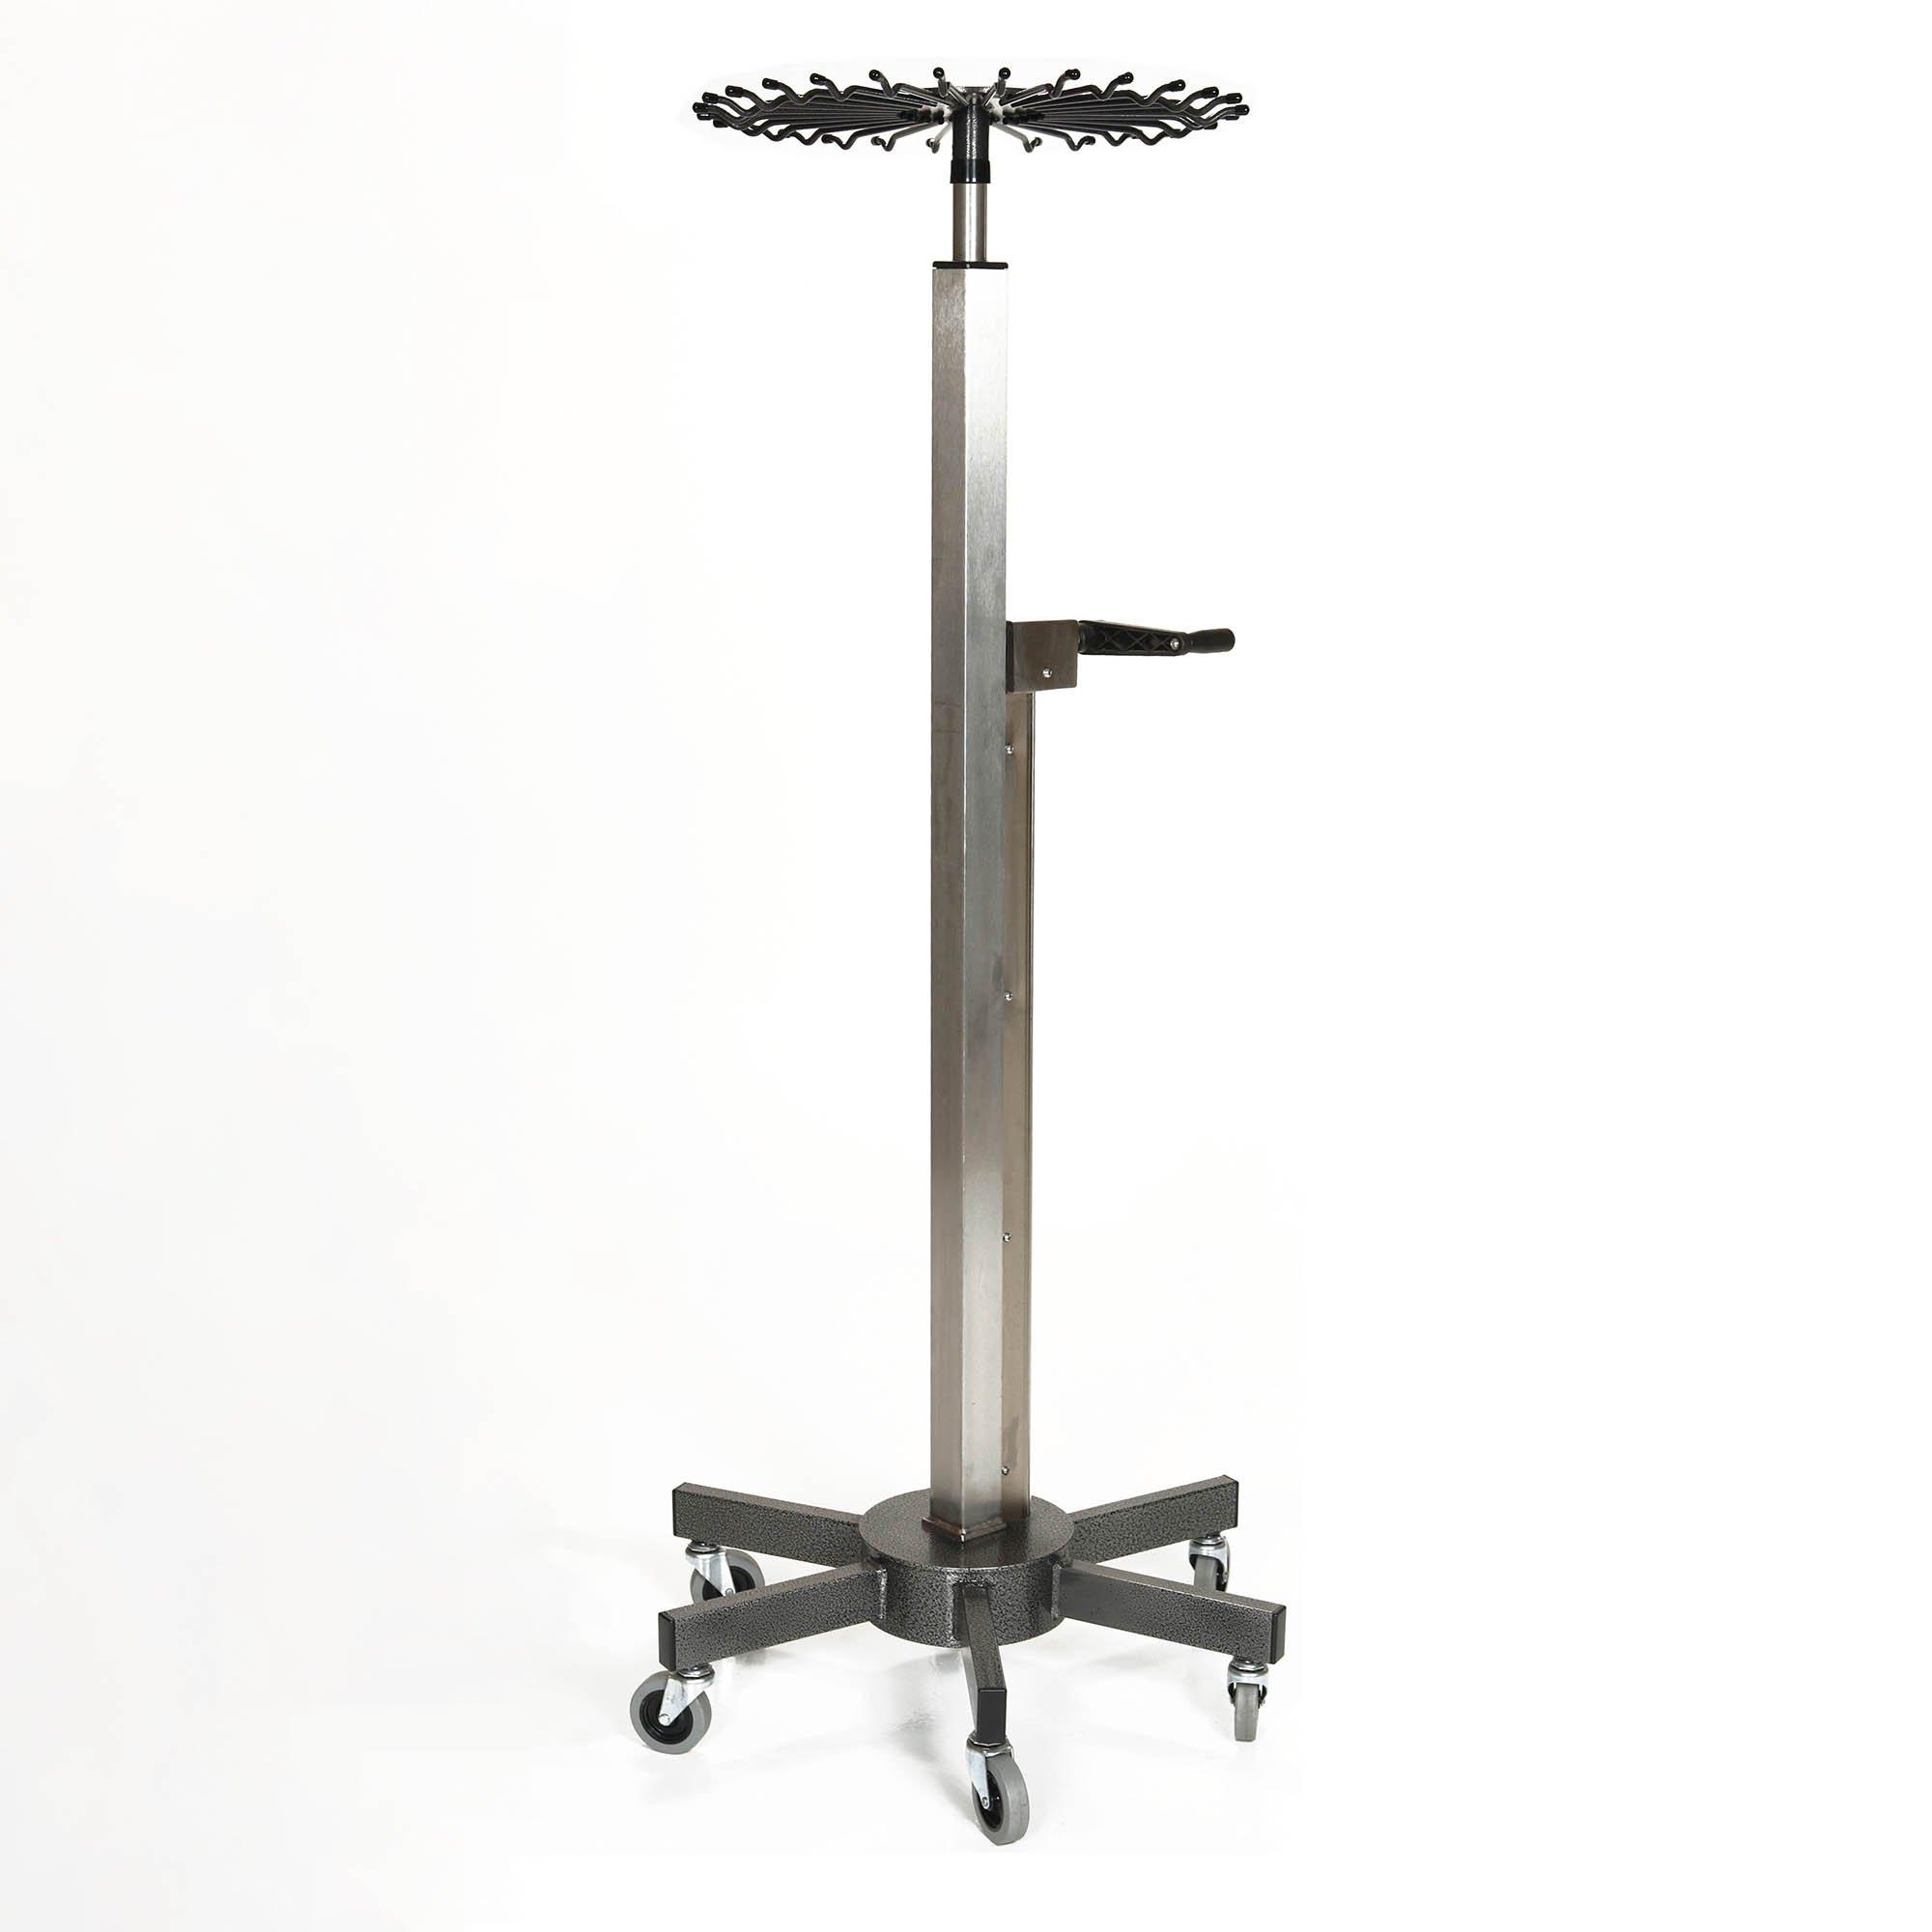 Lift Assist IV Pole with 28 Hooks